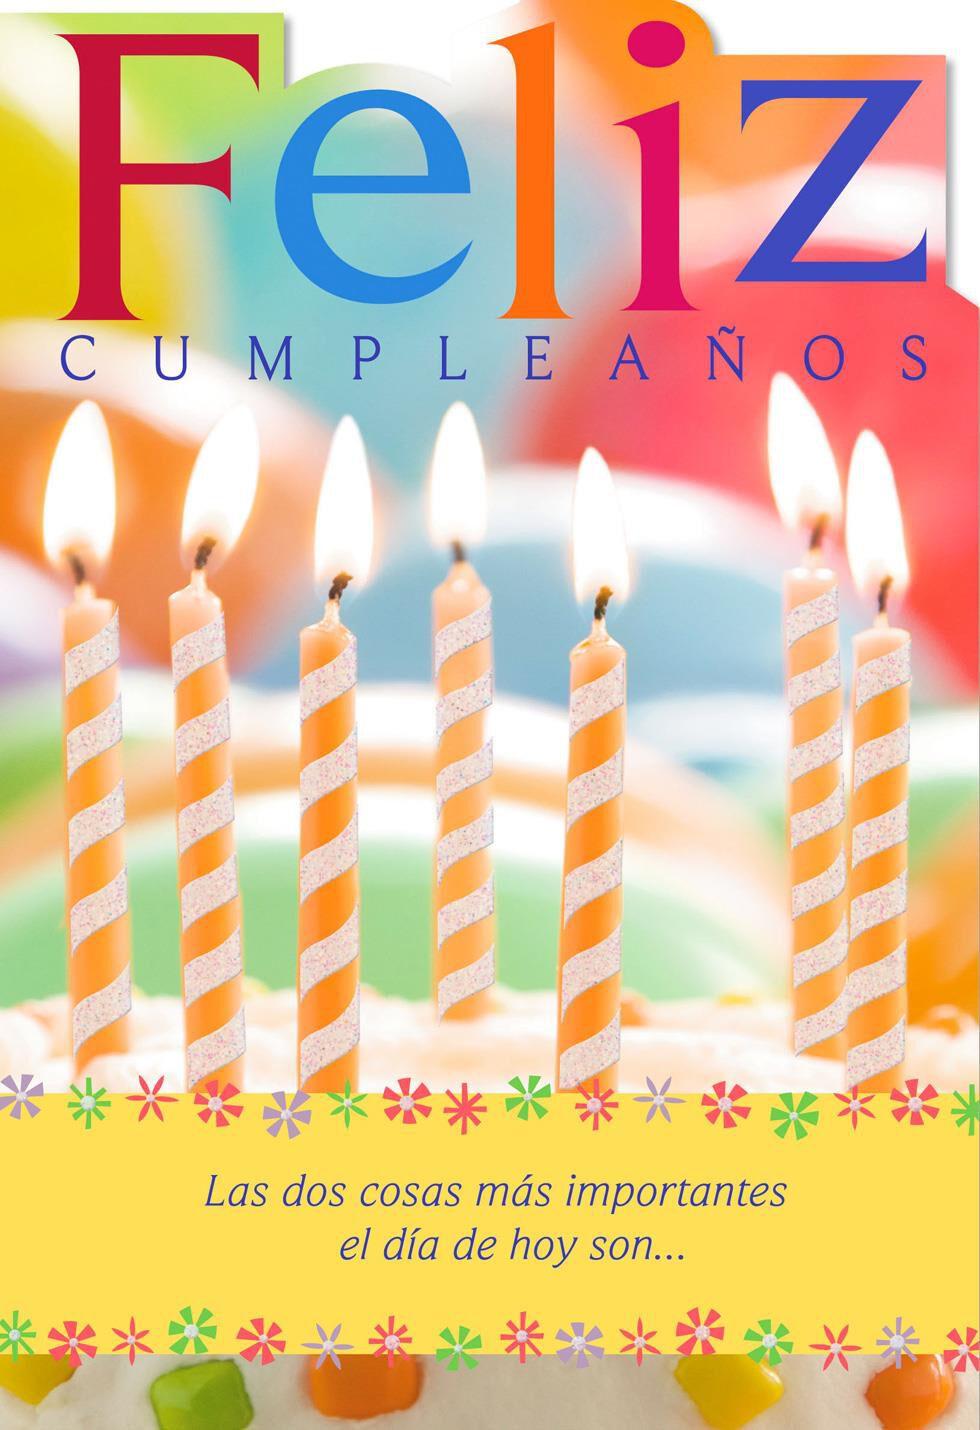 Candles SpanishLanguage Religious Birthday Card Greeting Cards – Spanish Birthday Cards